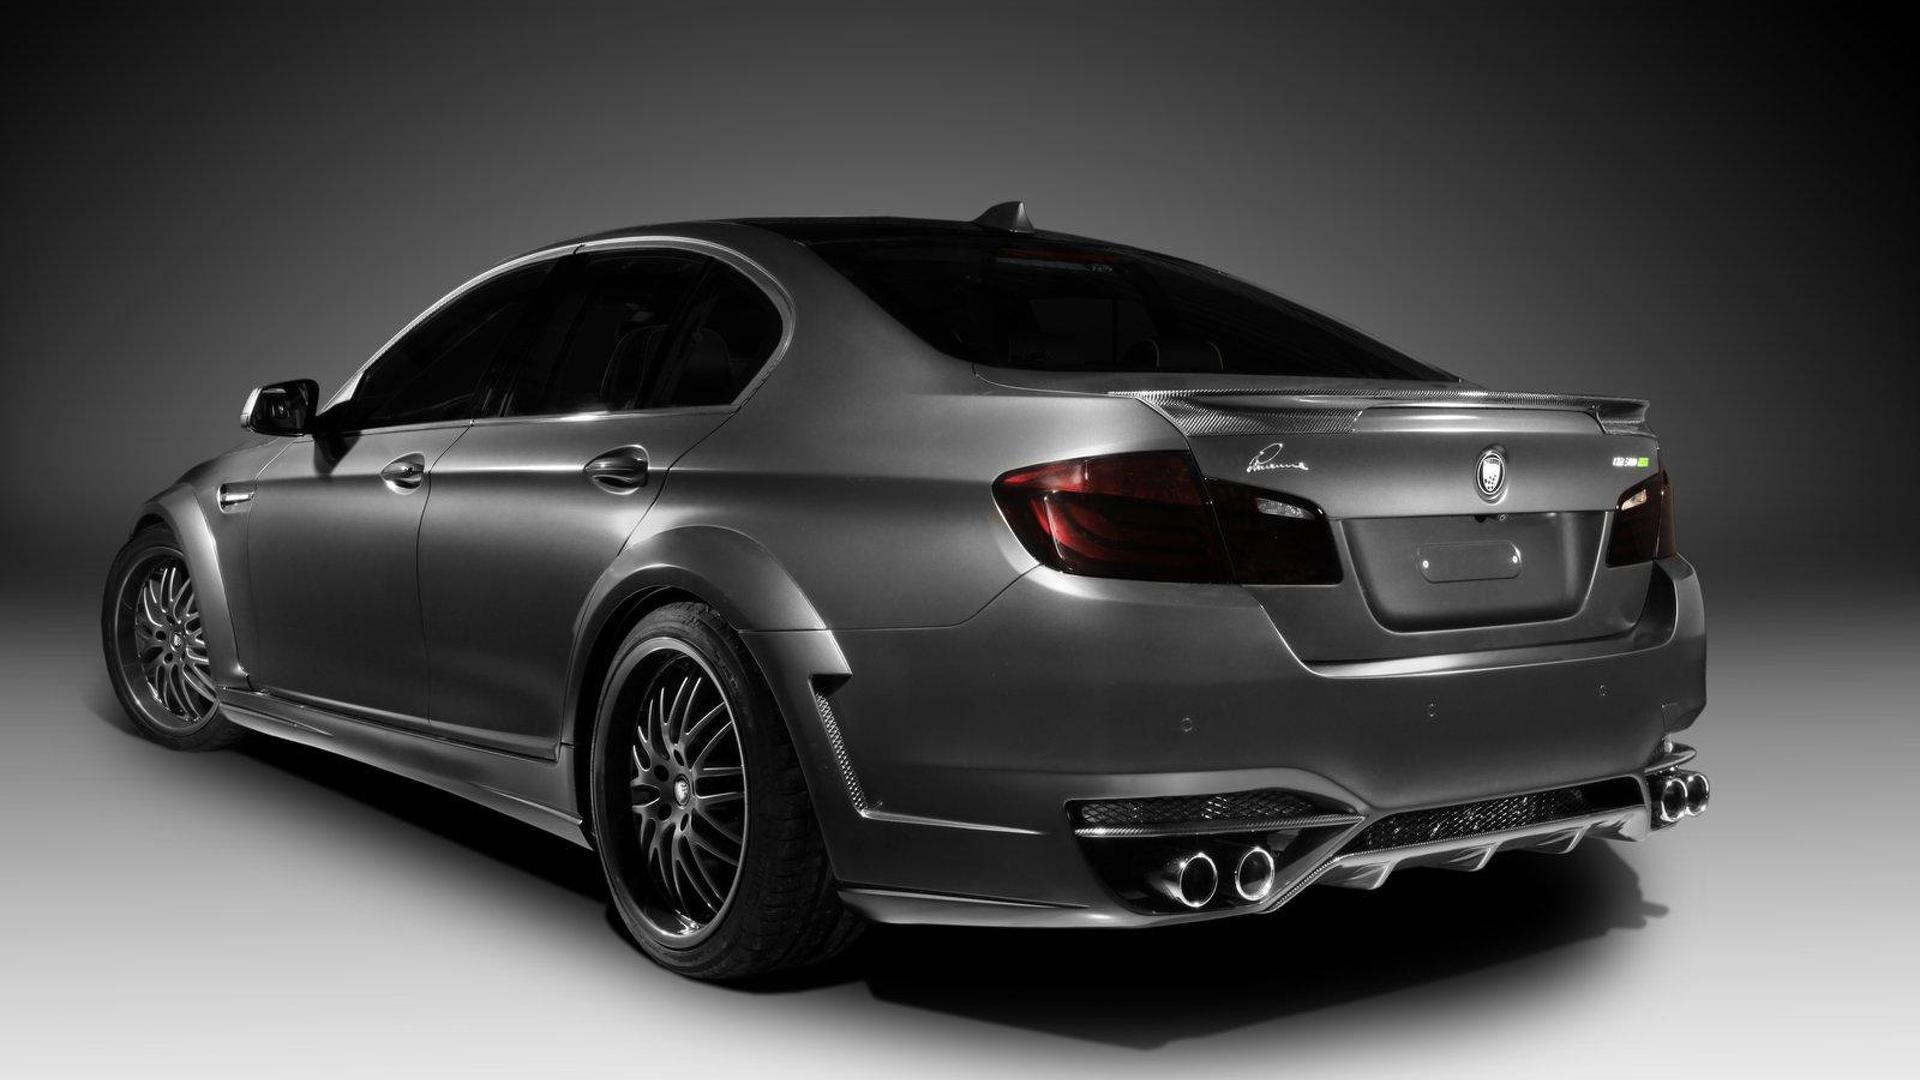 Bmw 500 Series >> Topcar Lumma Bmw Clr 500 Rs2 Revealed In Moscow